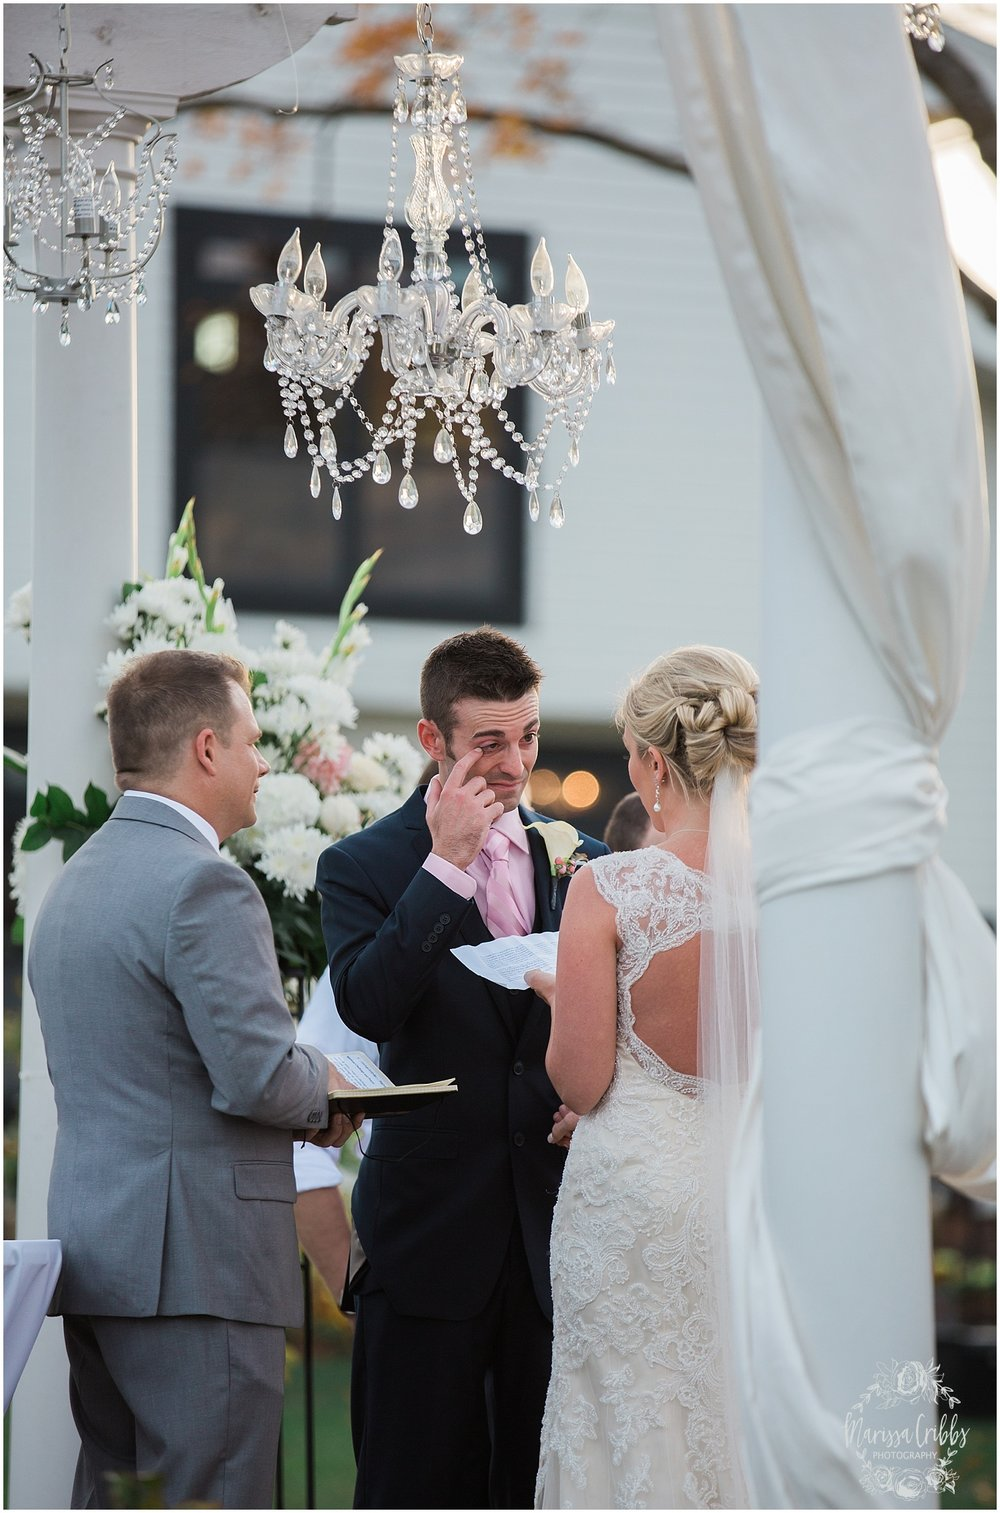 Alex & Amie | Eighteen Ninety Event Space | Marissa Cribbs Photography | Kansas City Perfect Wedding Guide_1346.jpg